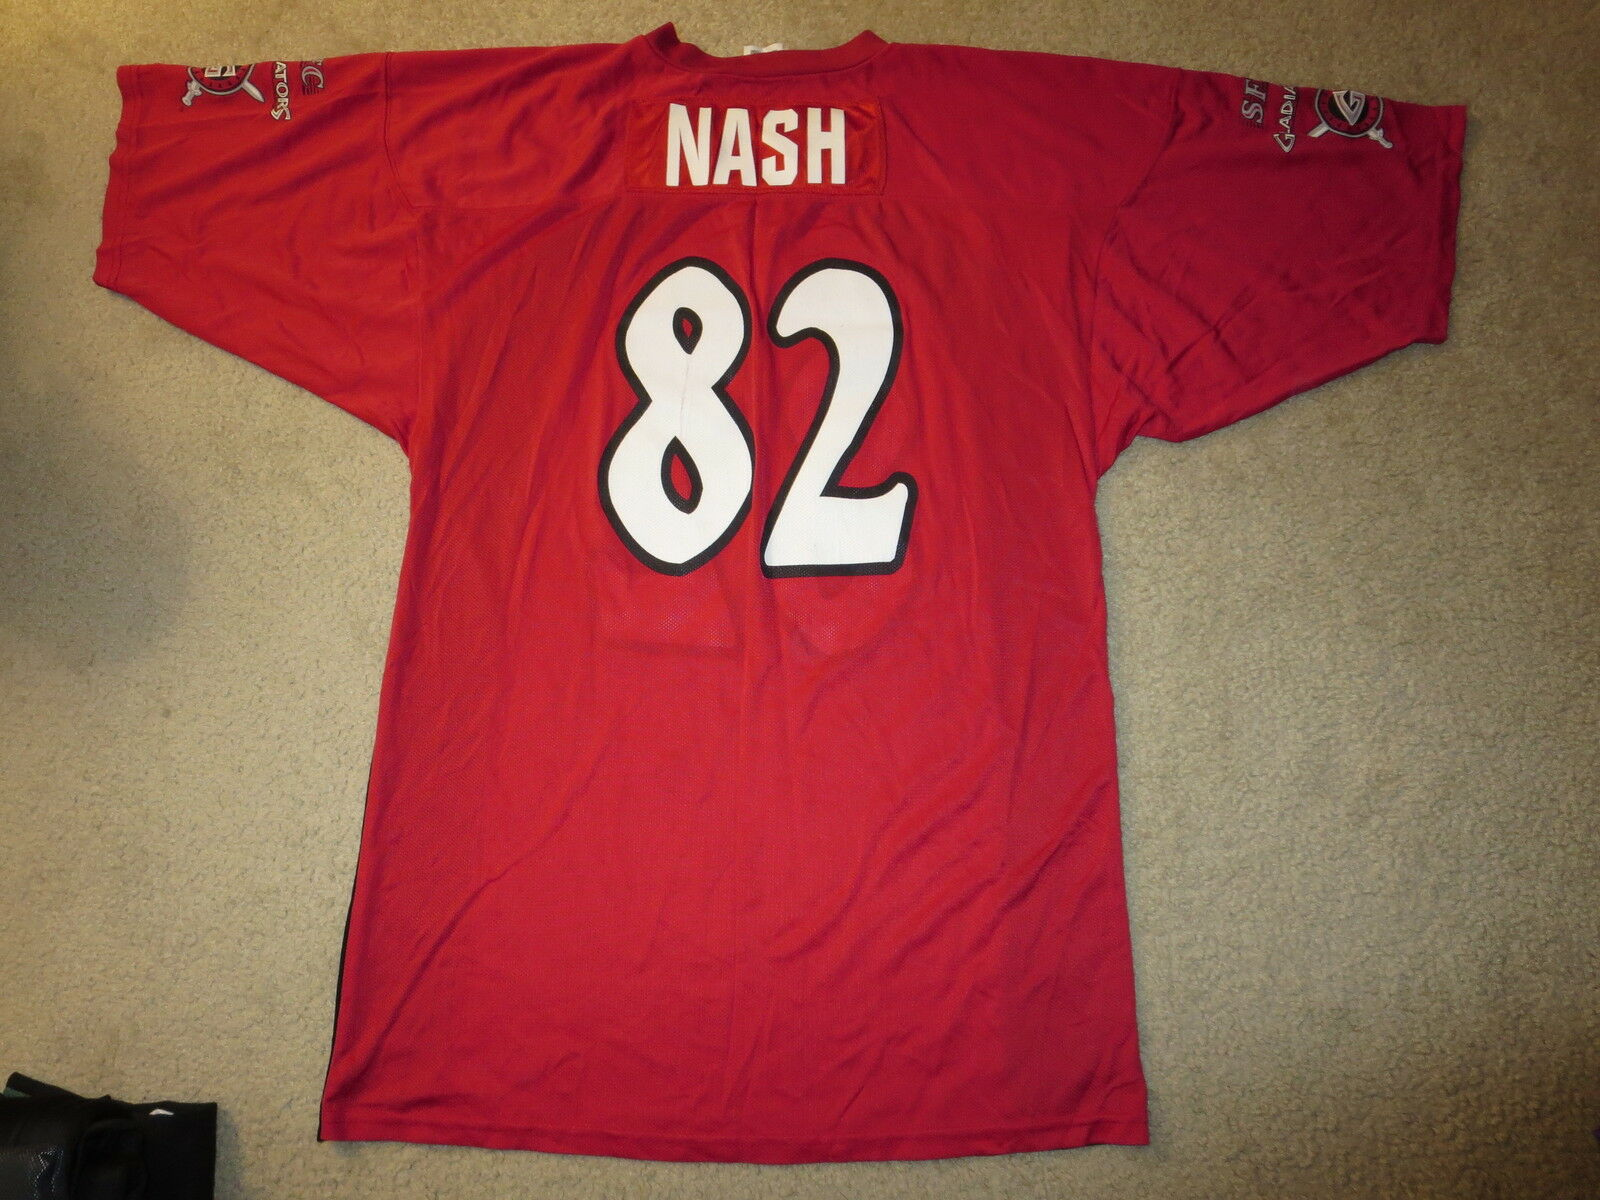 Marcus Nash  82 Las Vegas Gladiators Afl Afl Afl Arena Fußball League Trikot 483e74